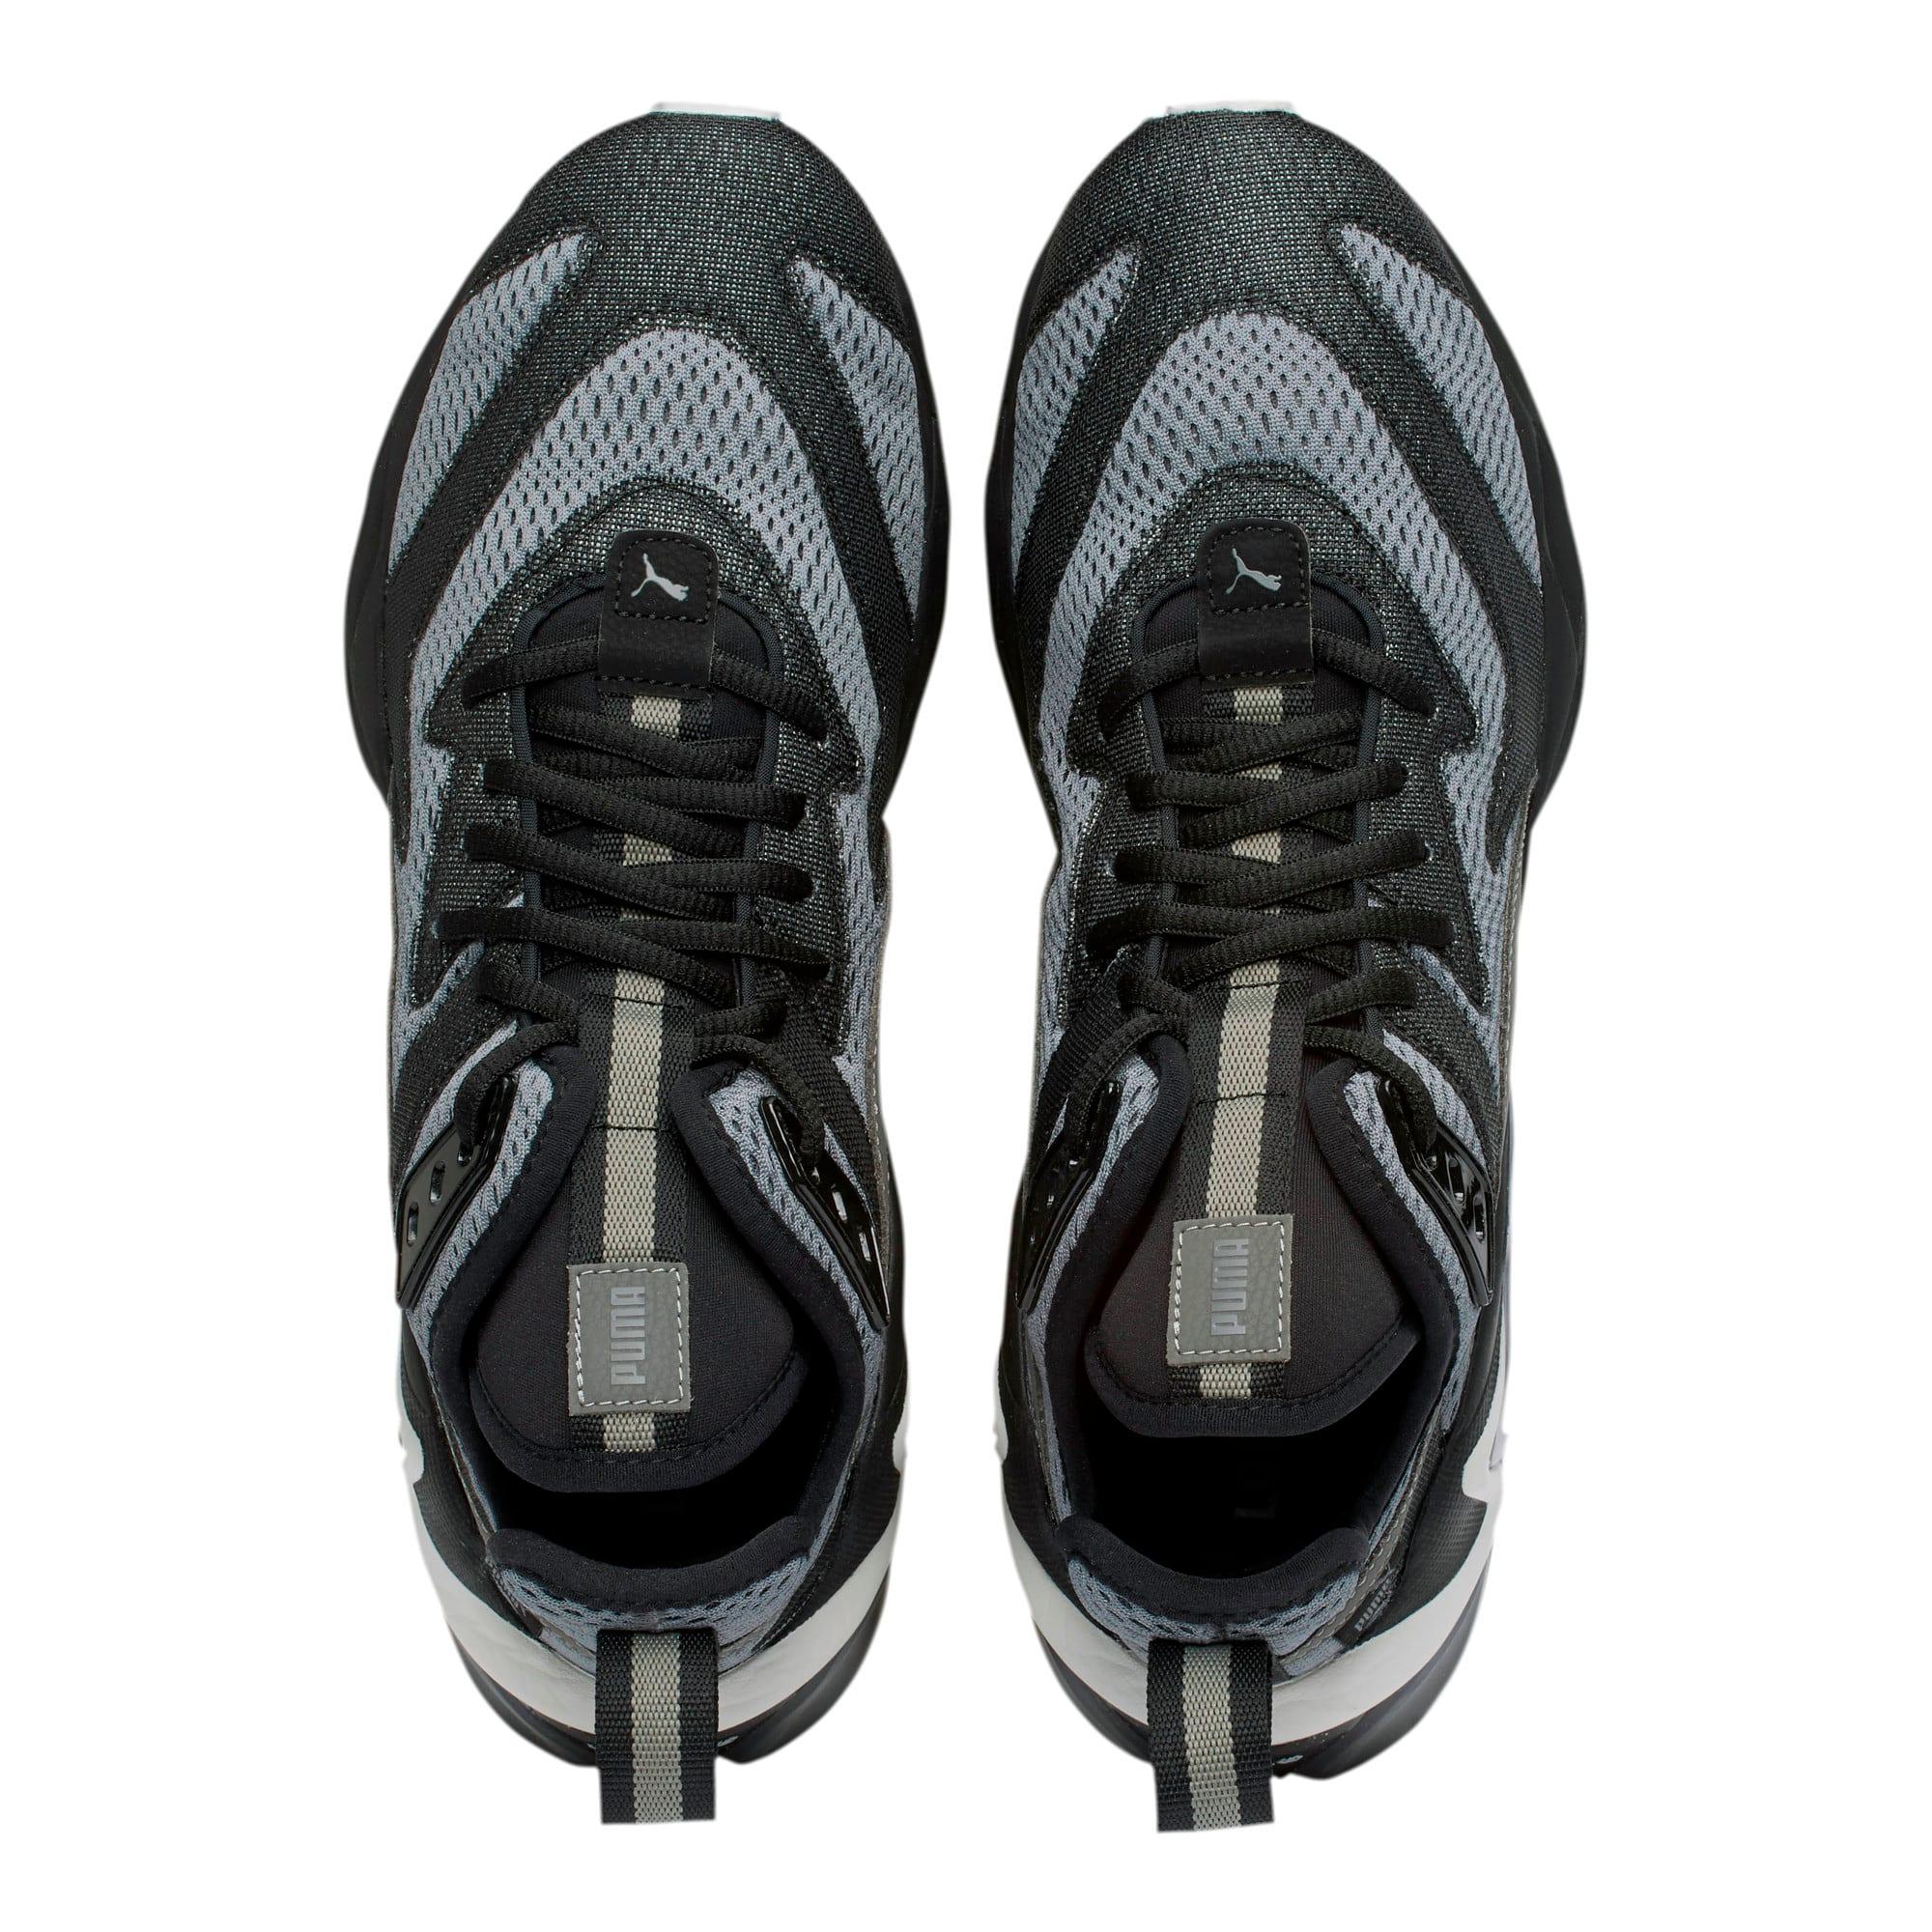 Thumbnail 7 of LQDCELL Origin Tech Men's Training Shoes, Puma Black-CASTLEROCK, medium